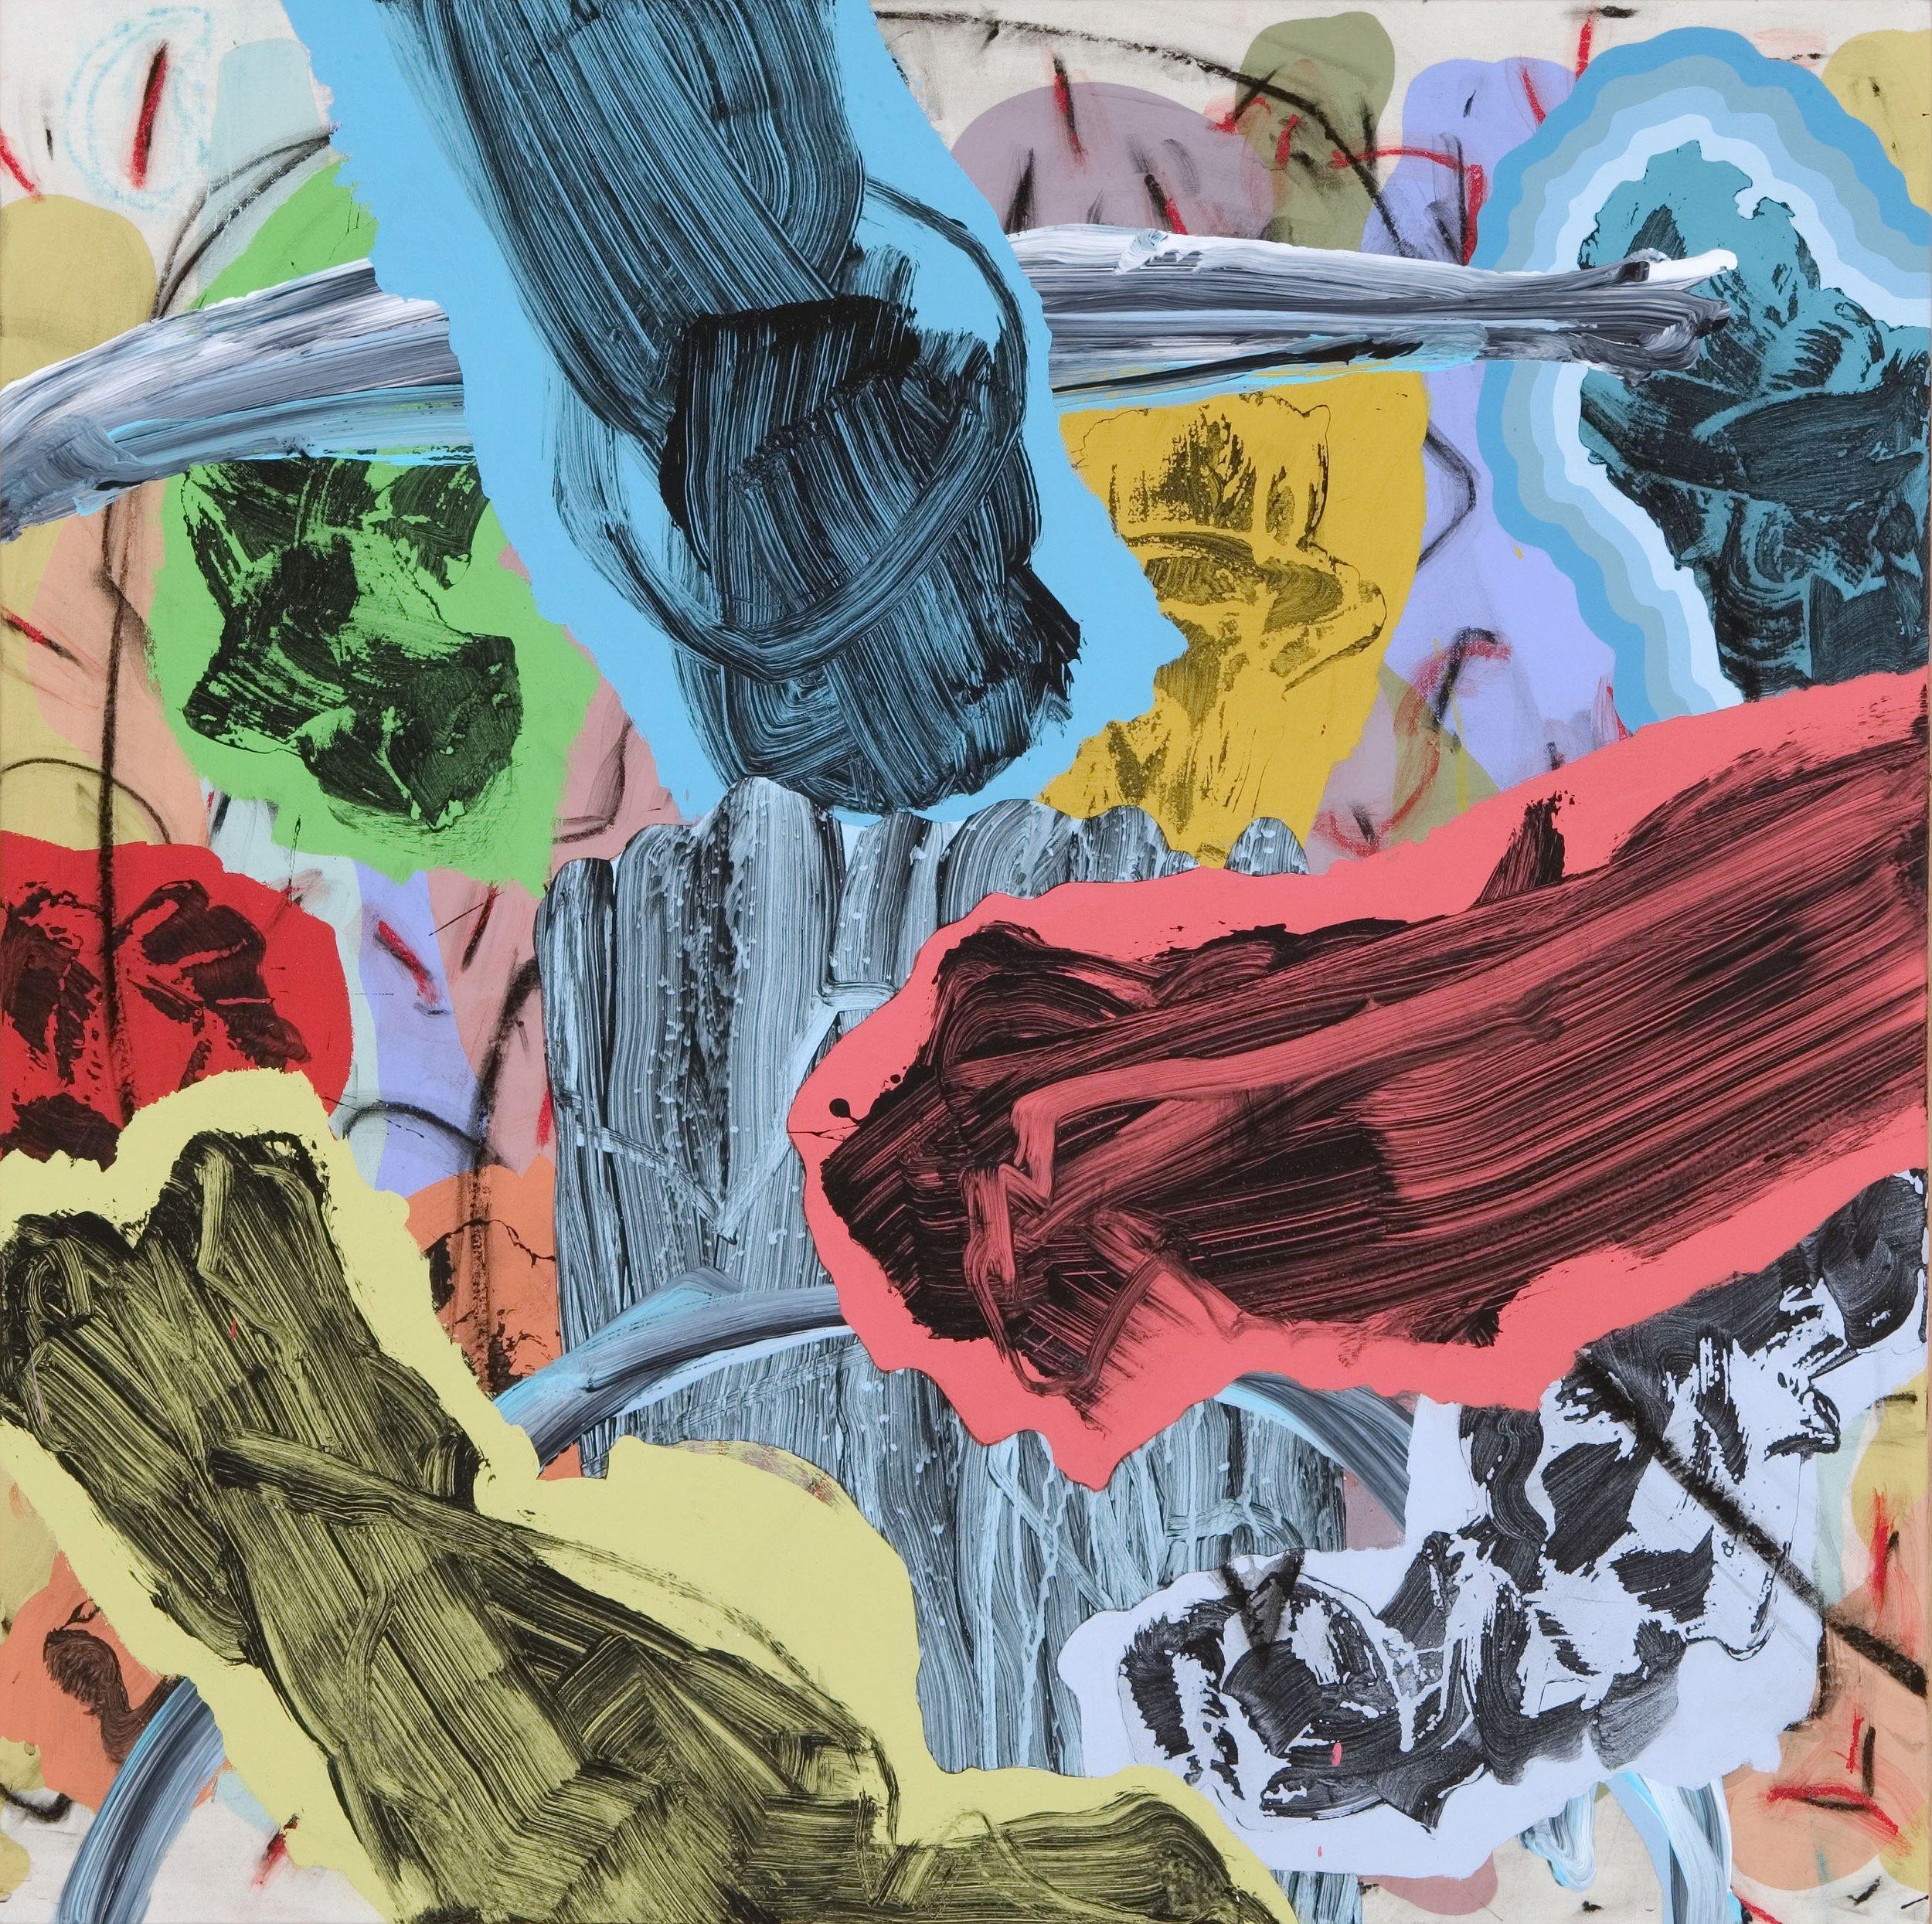 LONGITUDE AND LATITUDE, 2015   mixed media on canvas 30 x 30 in.